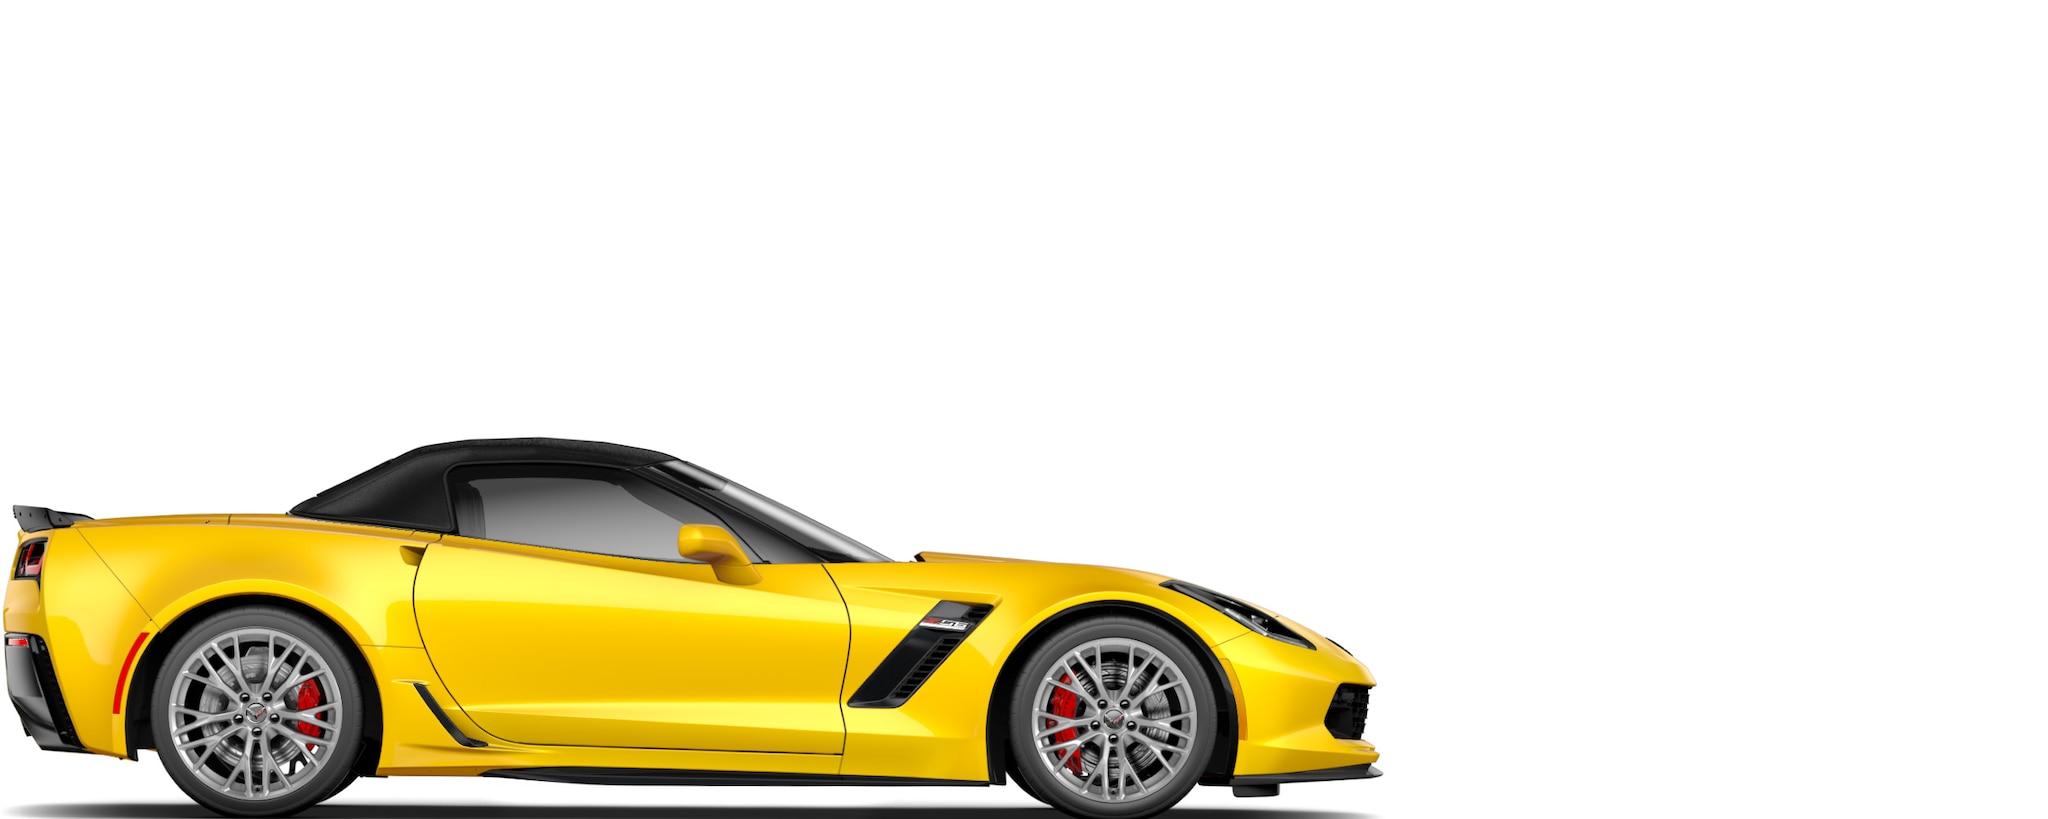 Corvette Z06 Convertible 2017